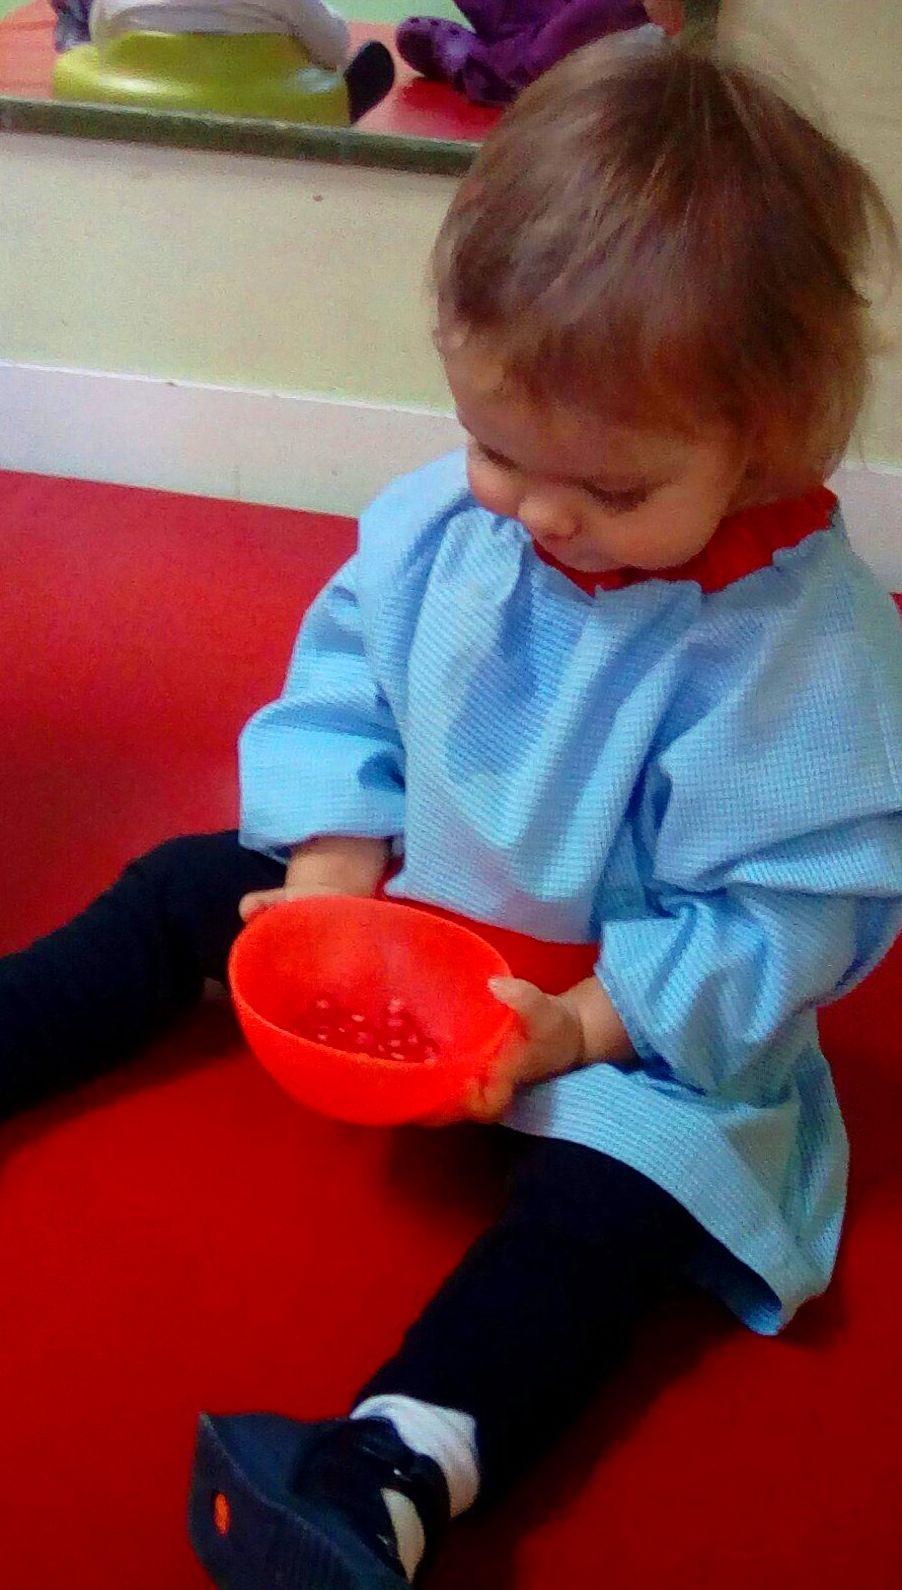 Foto 26 de Escuela infantil en Algete | E.I. Cuatro Pecas de Colores